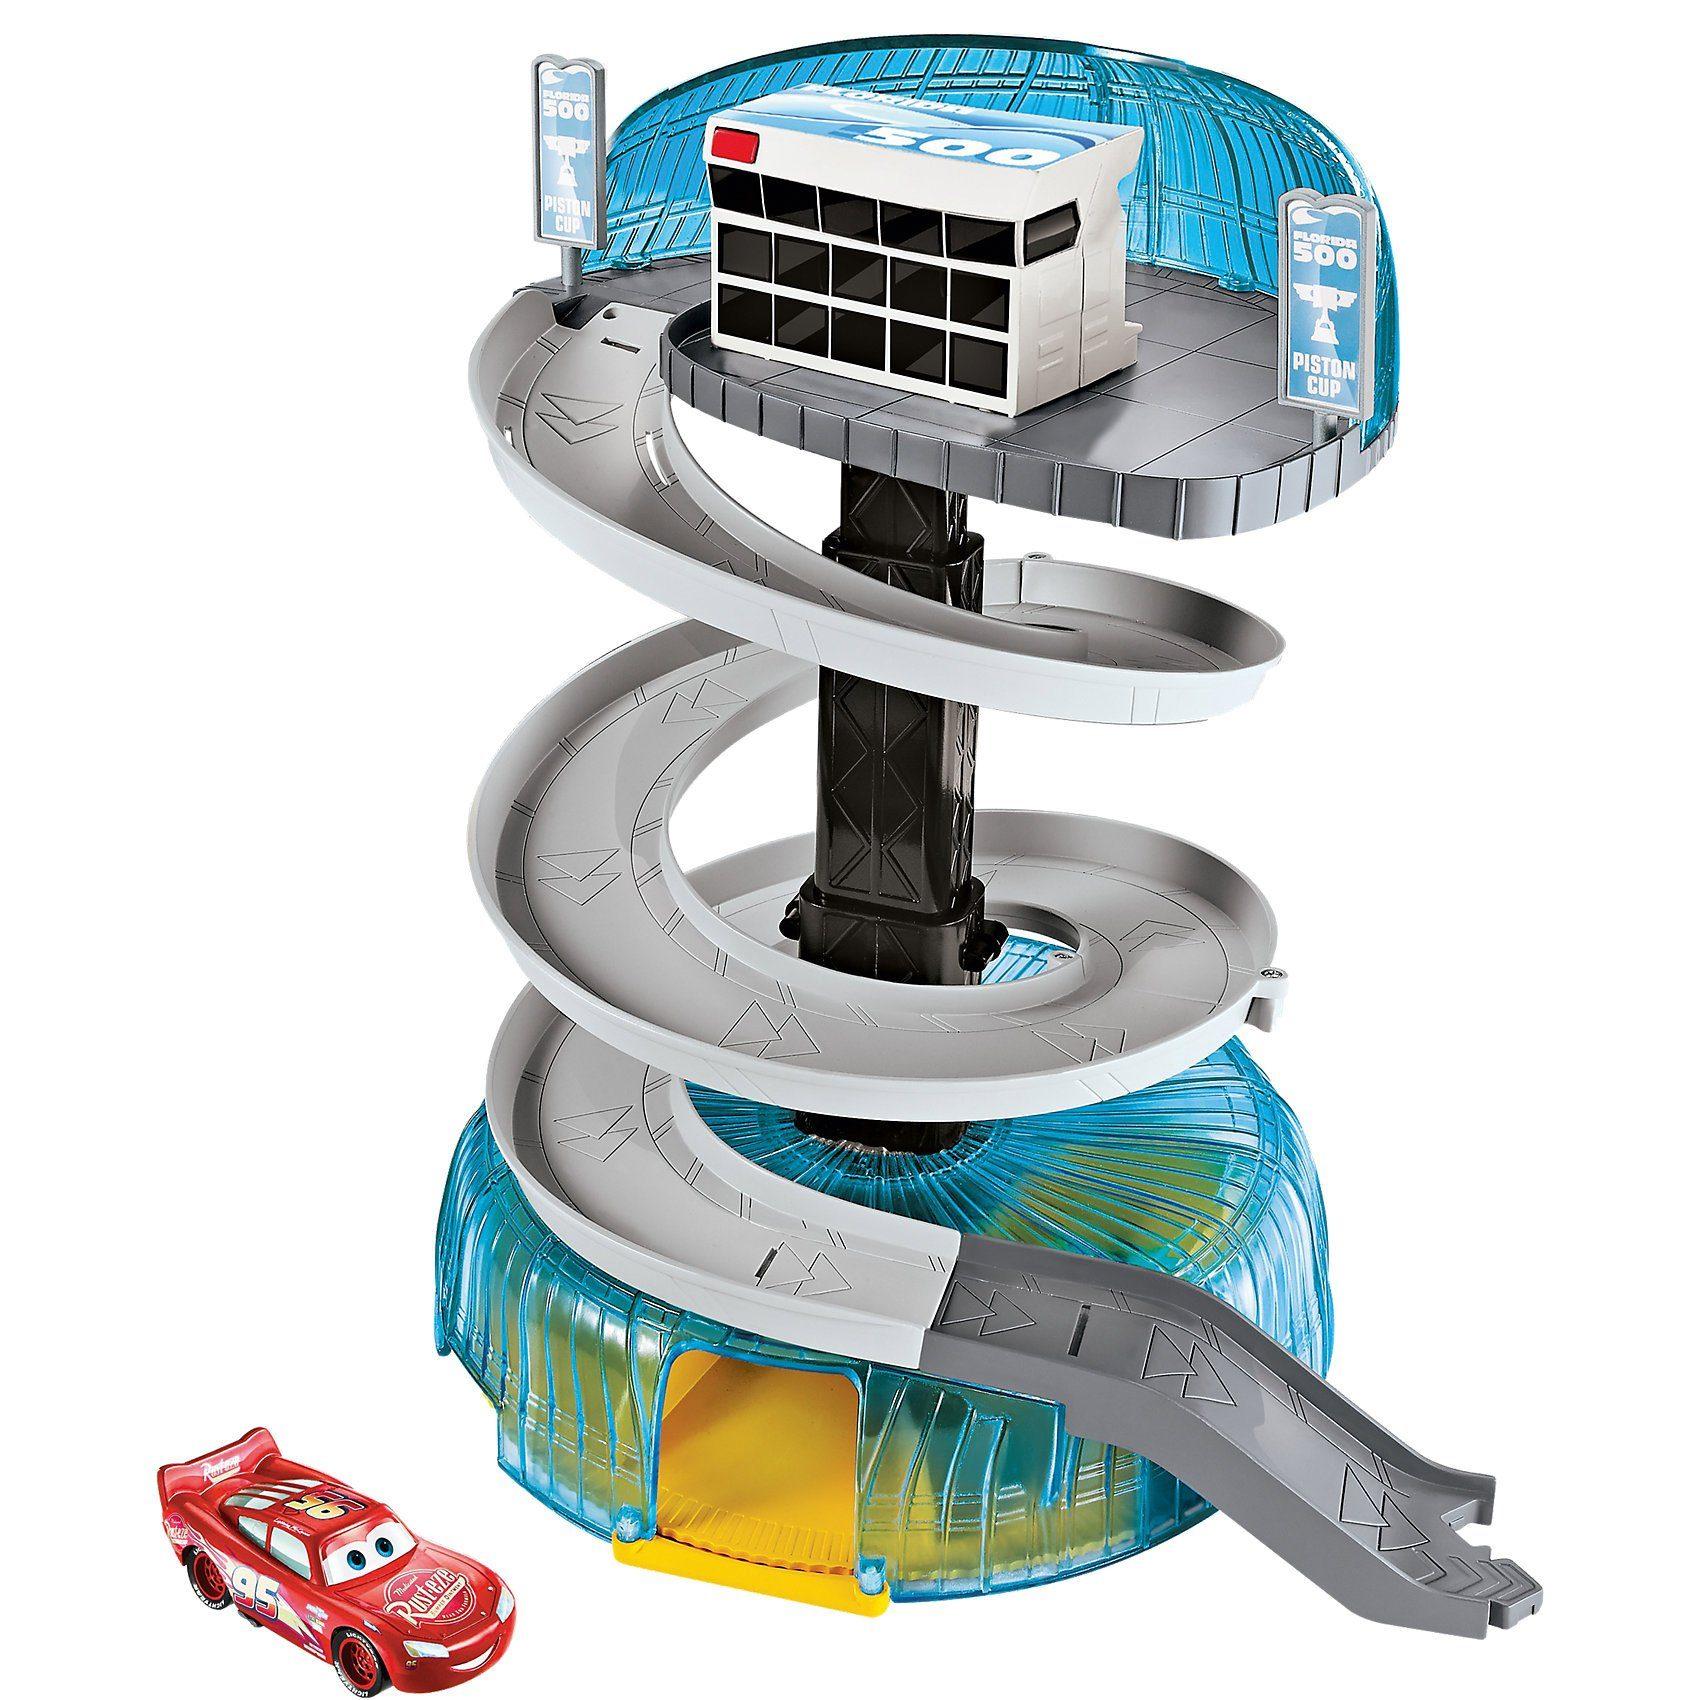 Mattel® Disney Cars 3 Florida Rennstrecken-Turm Spielset